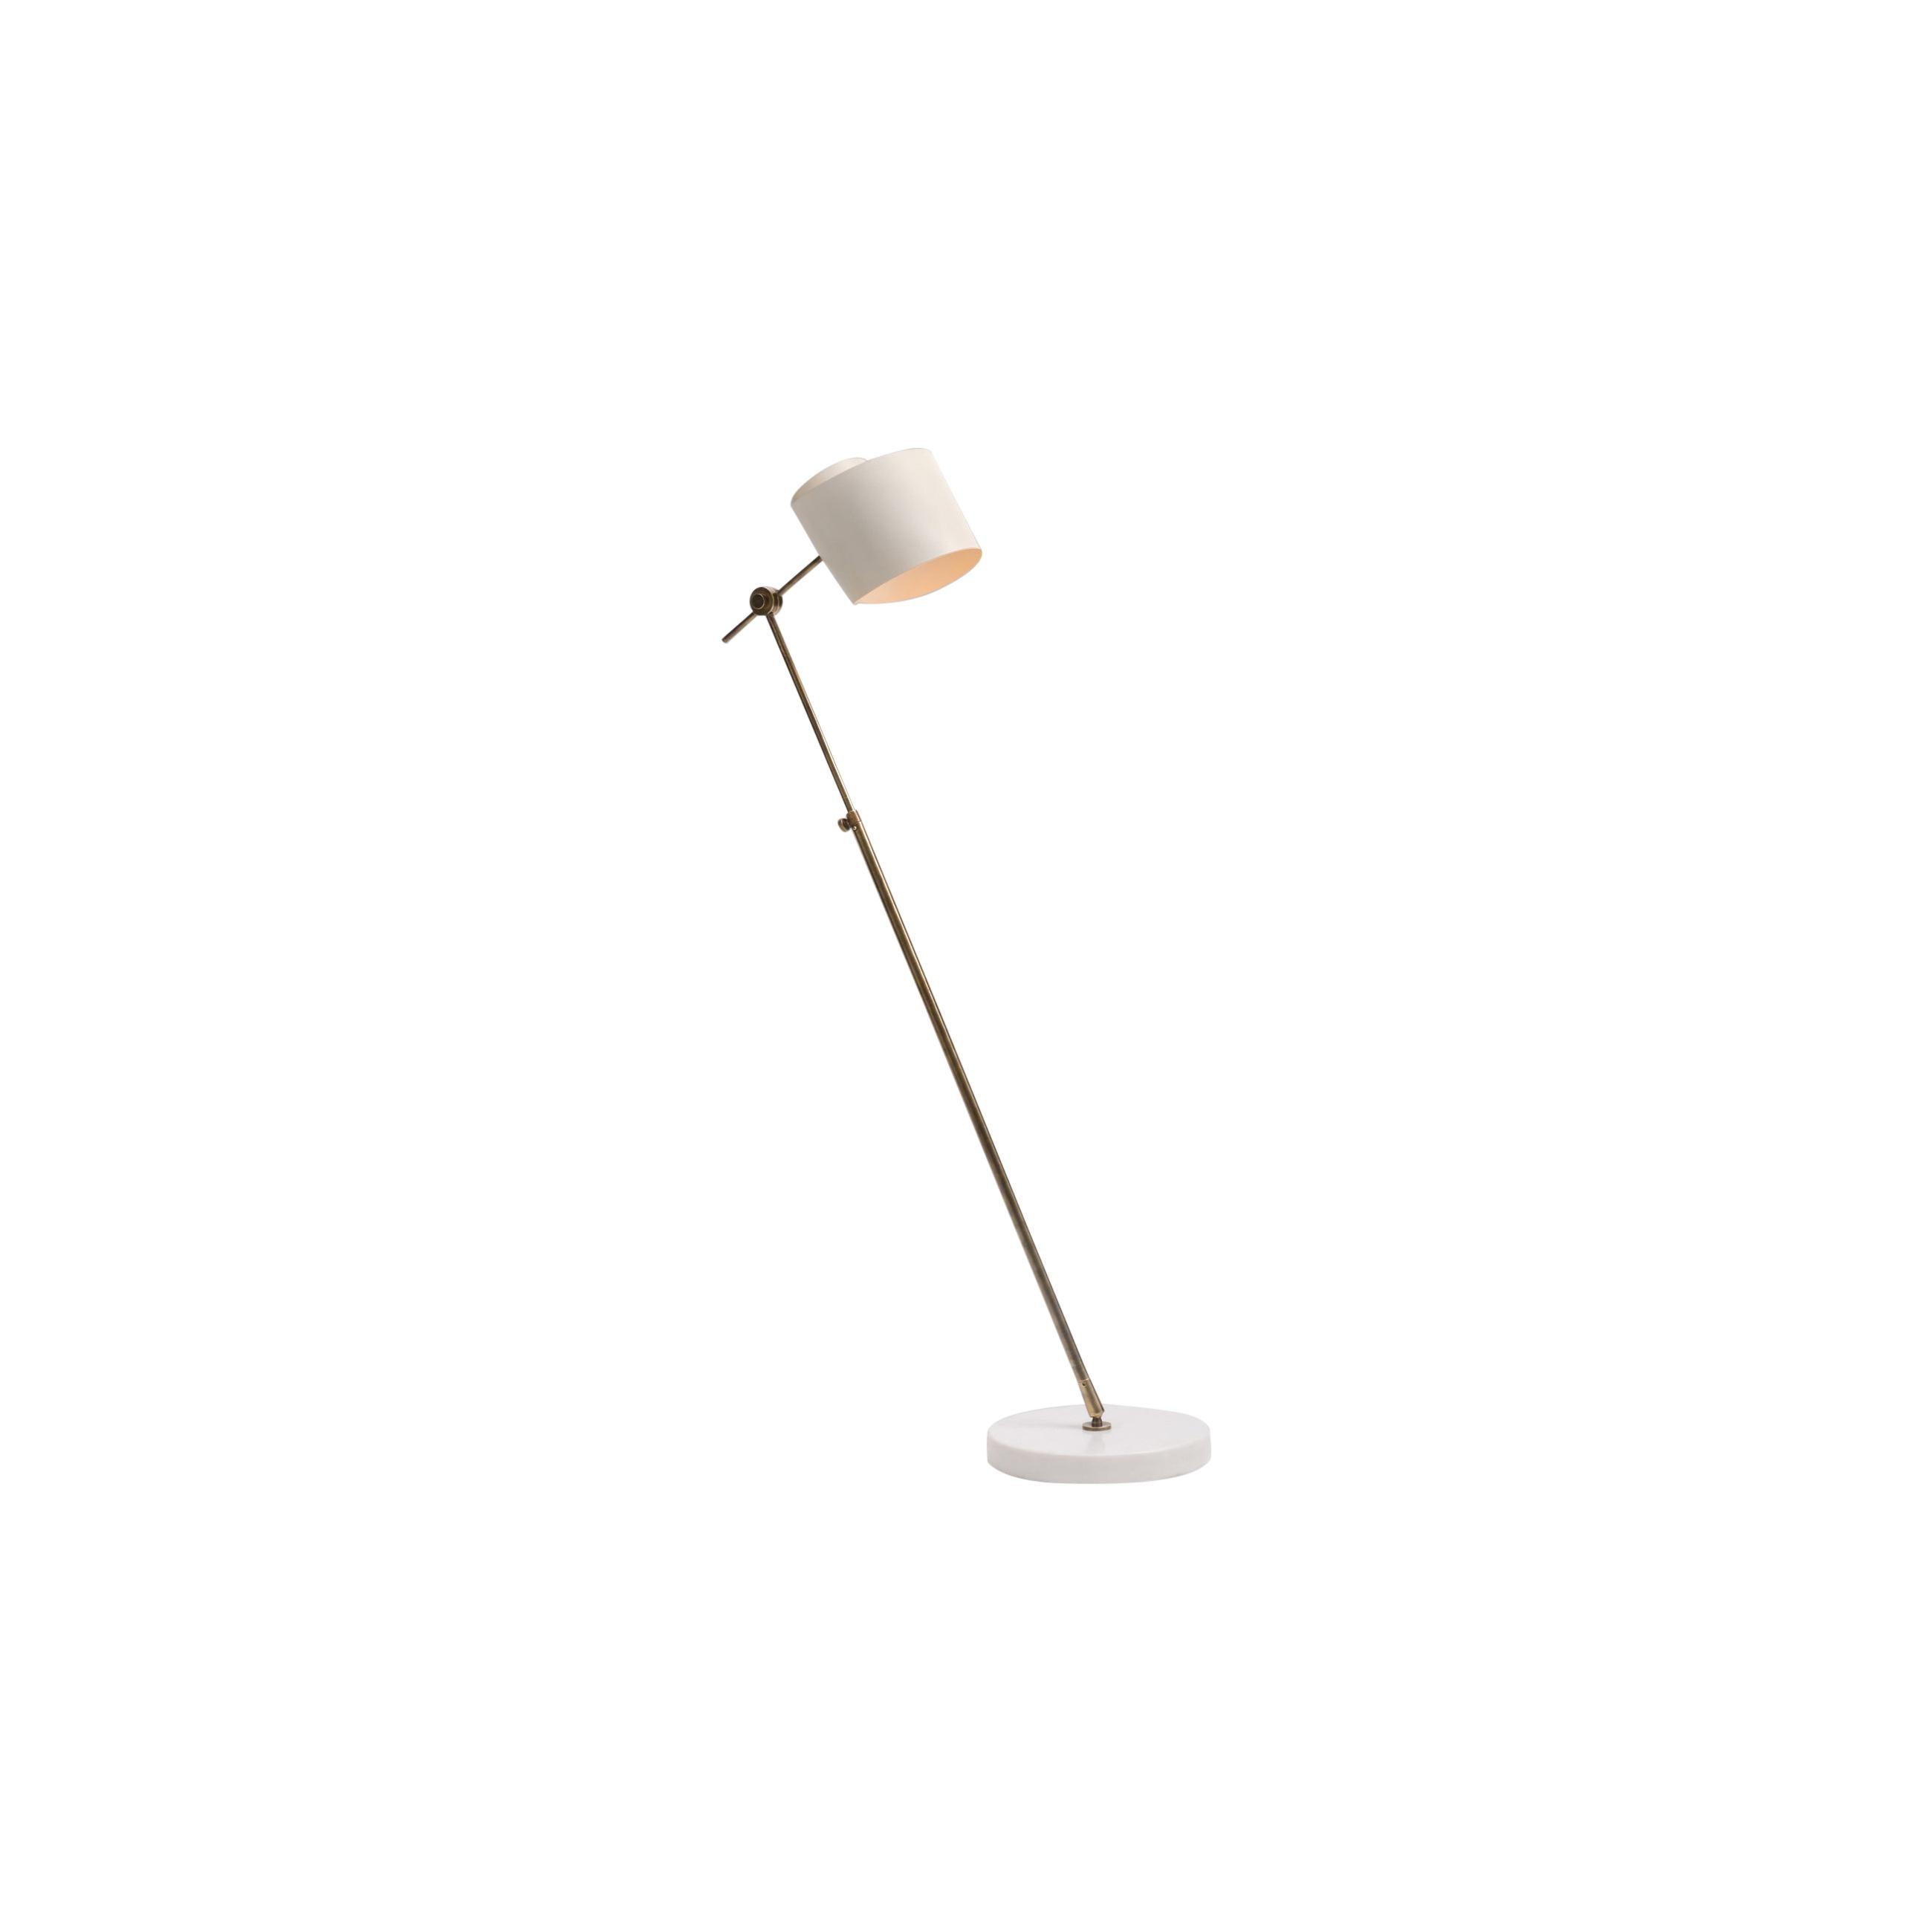 Tito Agnoli Floor Lamp for Oluce, Italy, 1950's